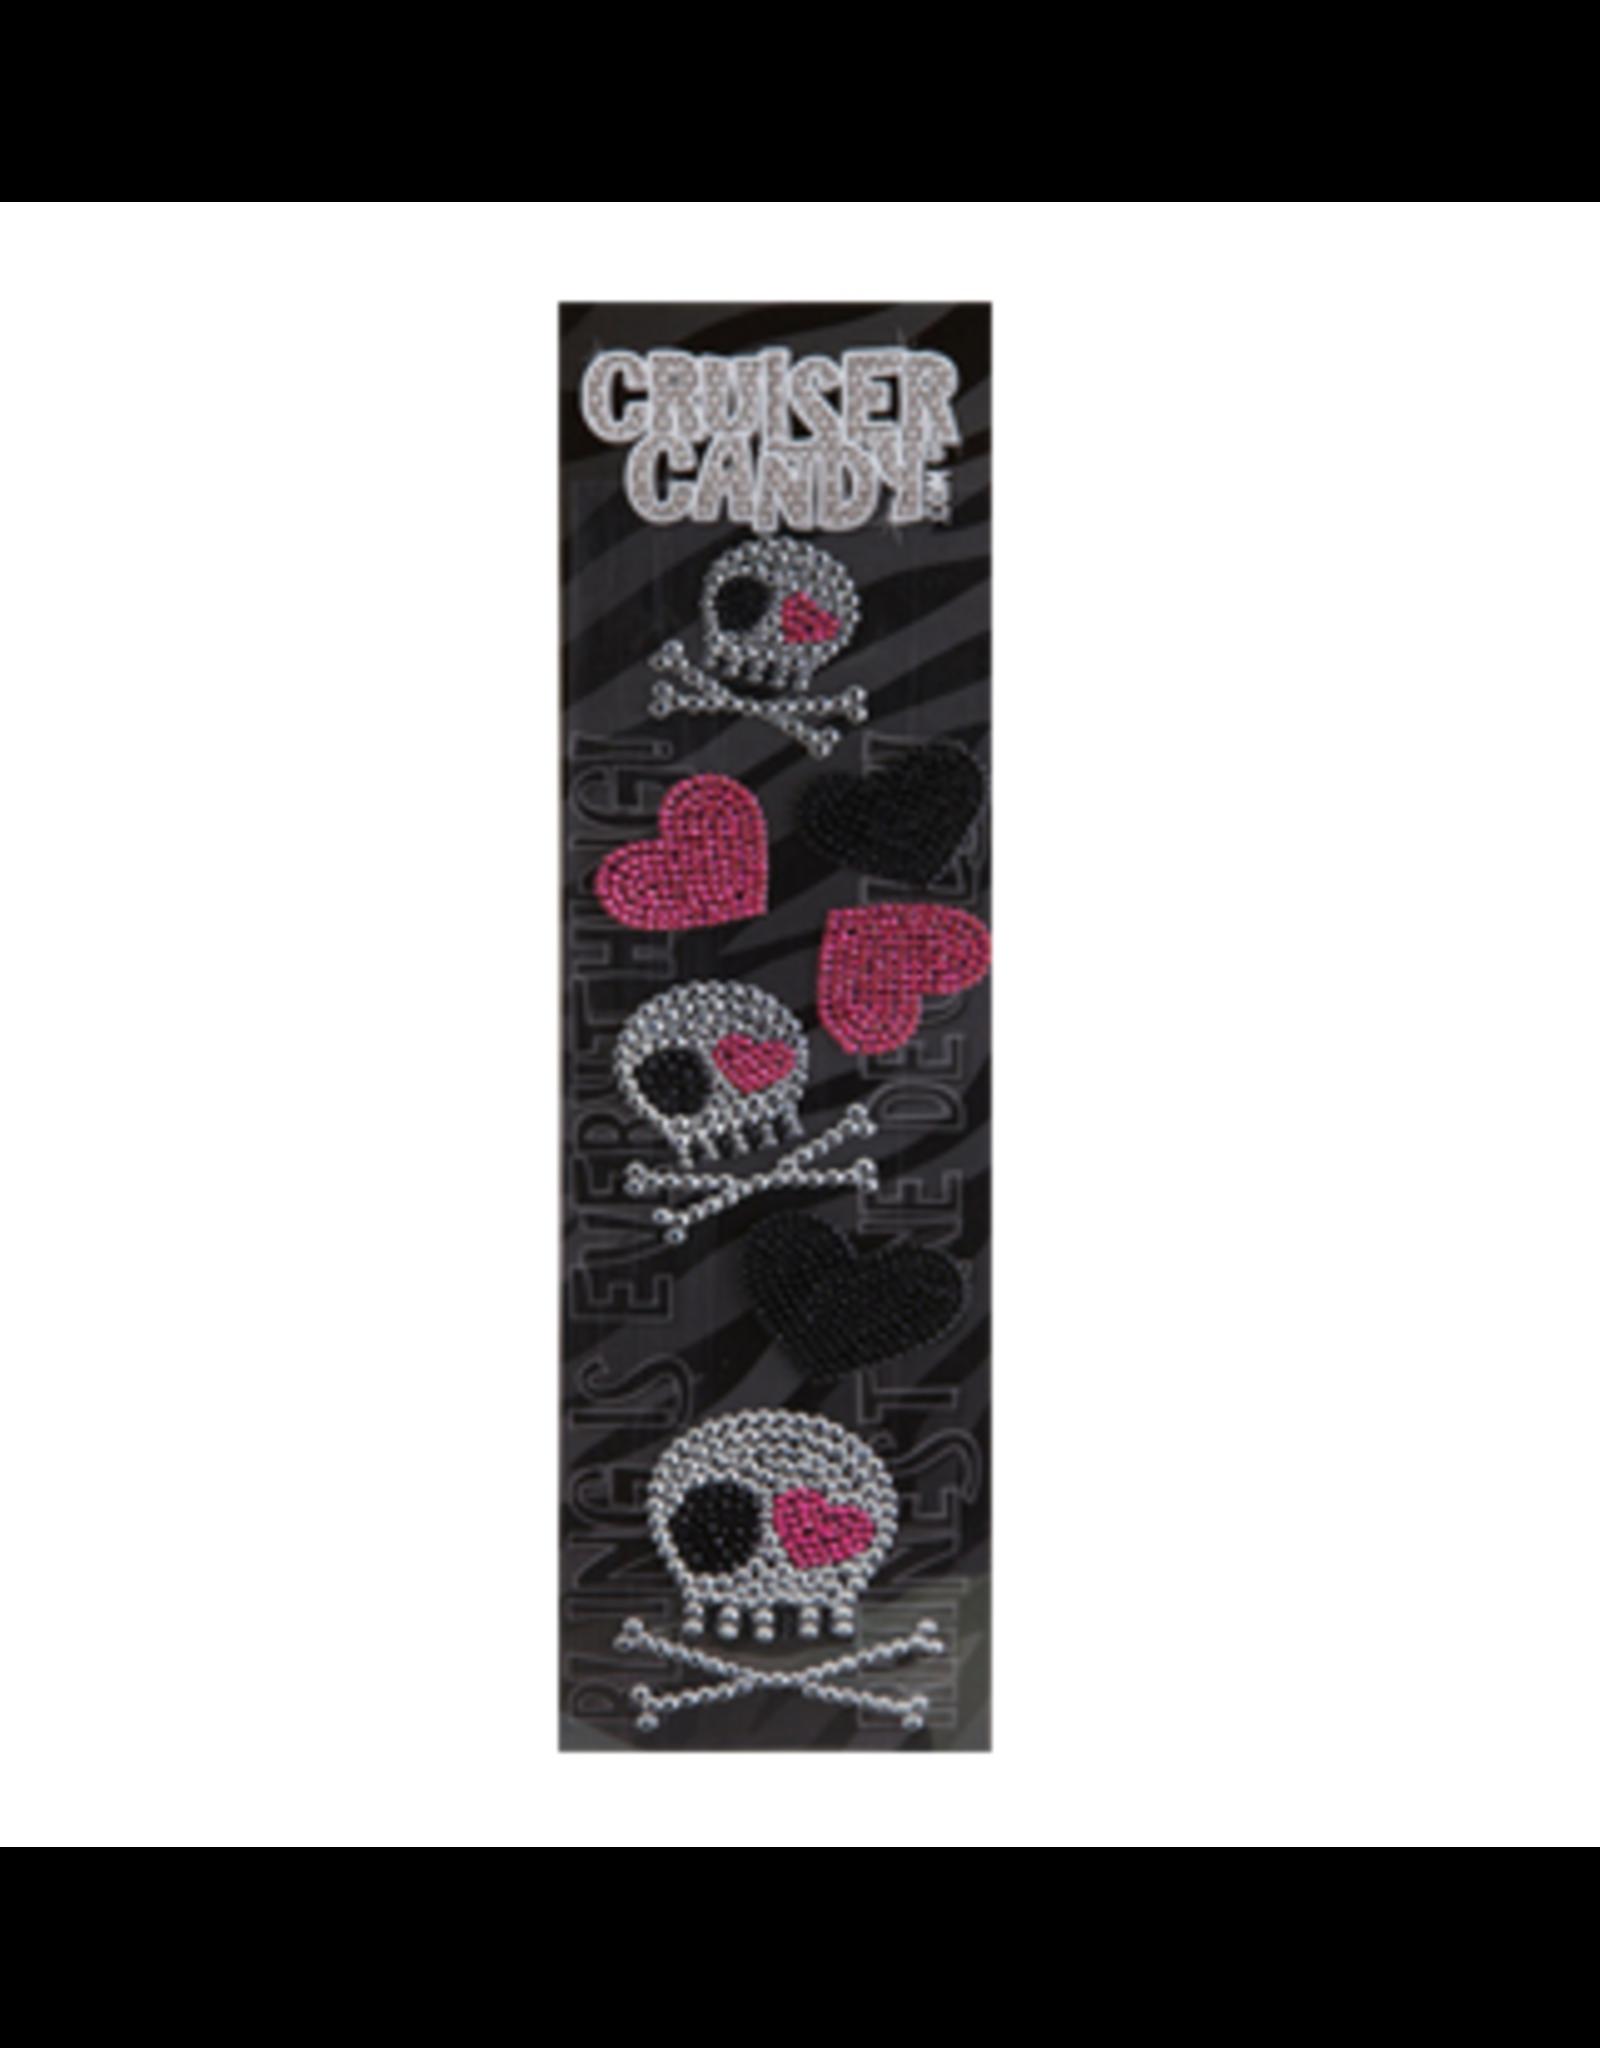 Cruiser Candy Cruiser Candy Decals - Skull Rhinestone